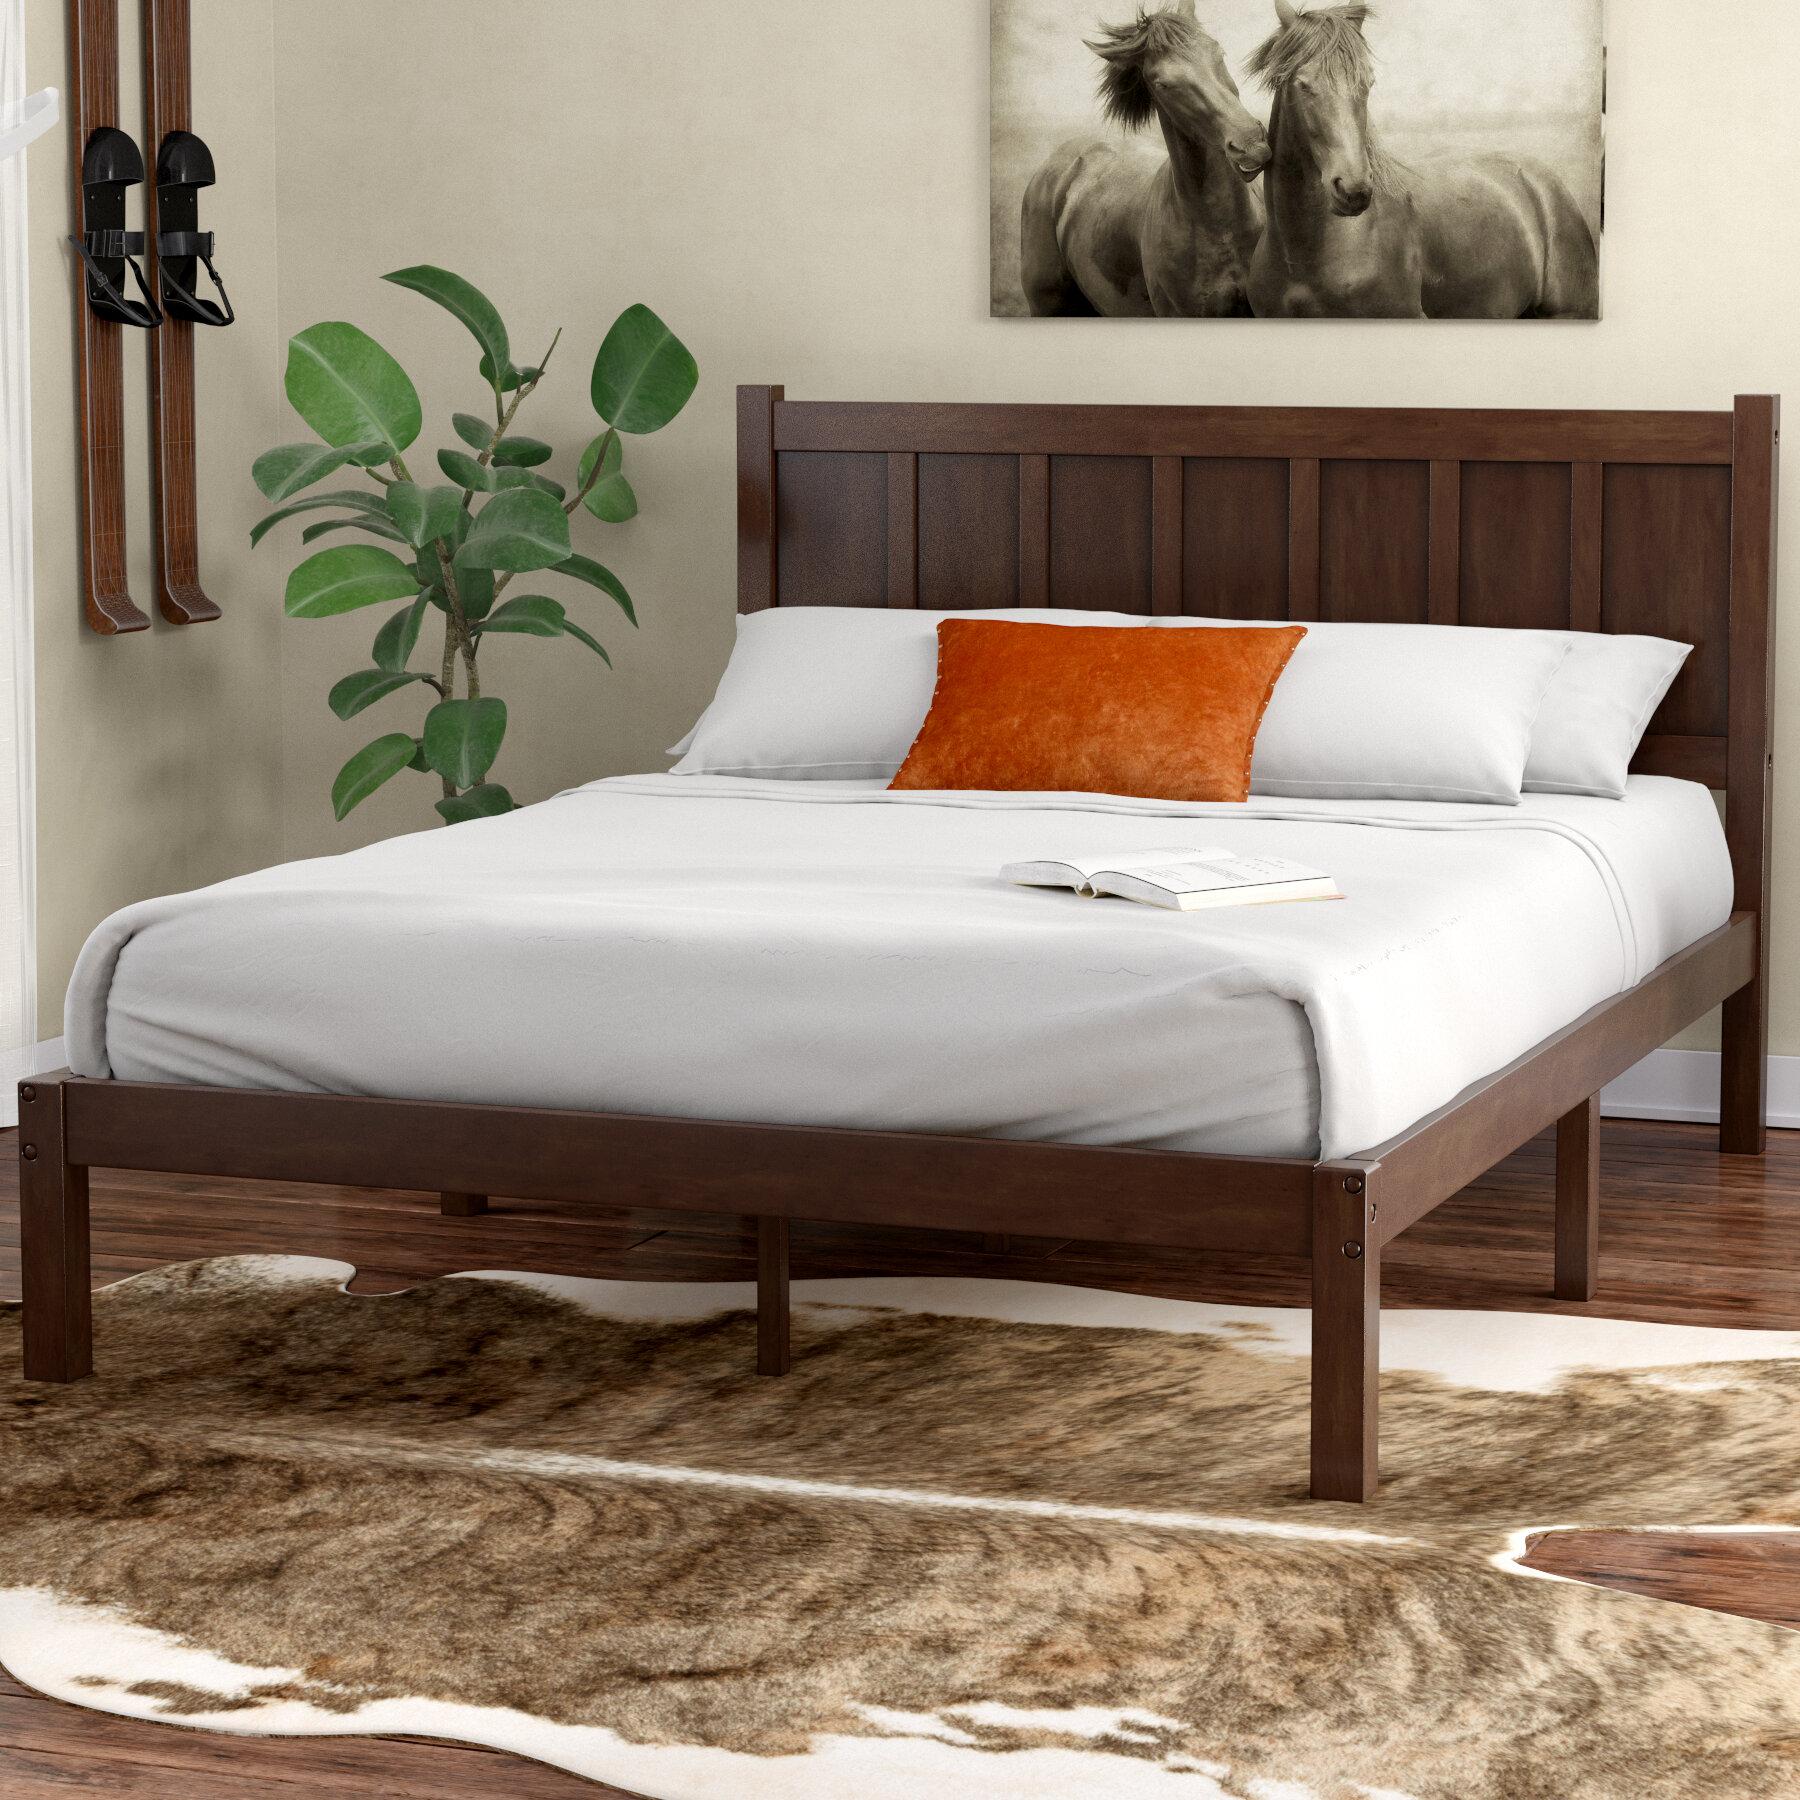 Rustic Beds Frames You Ll Love In 2020 Wayfair